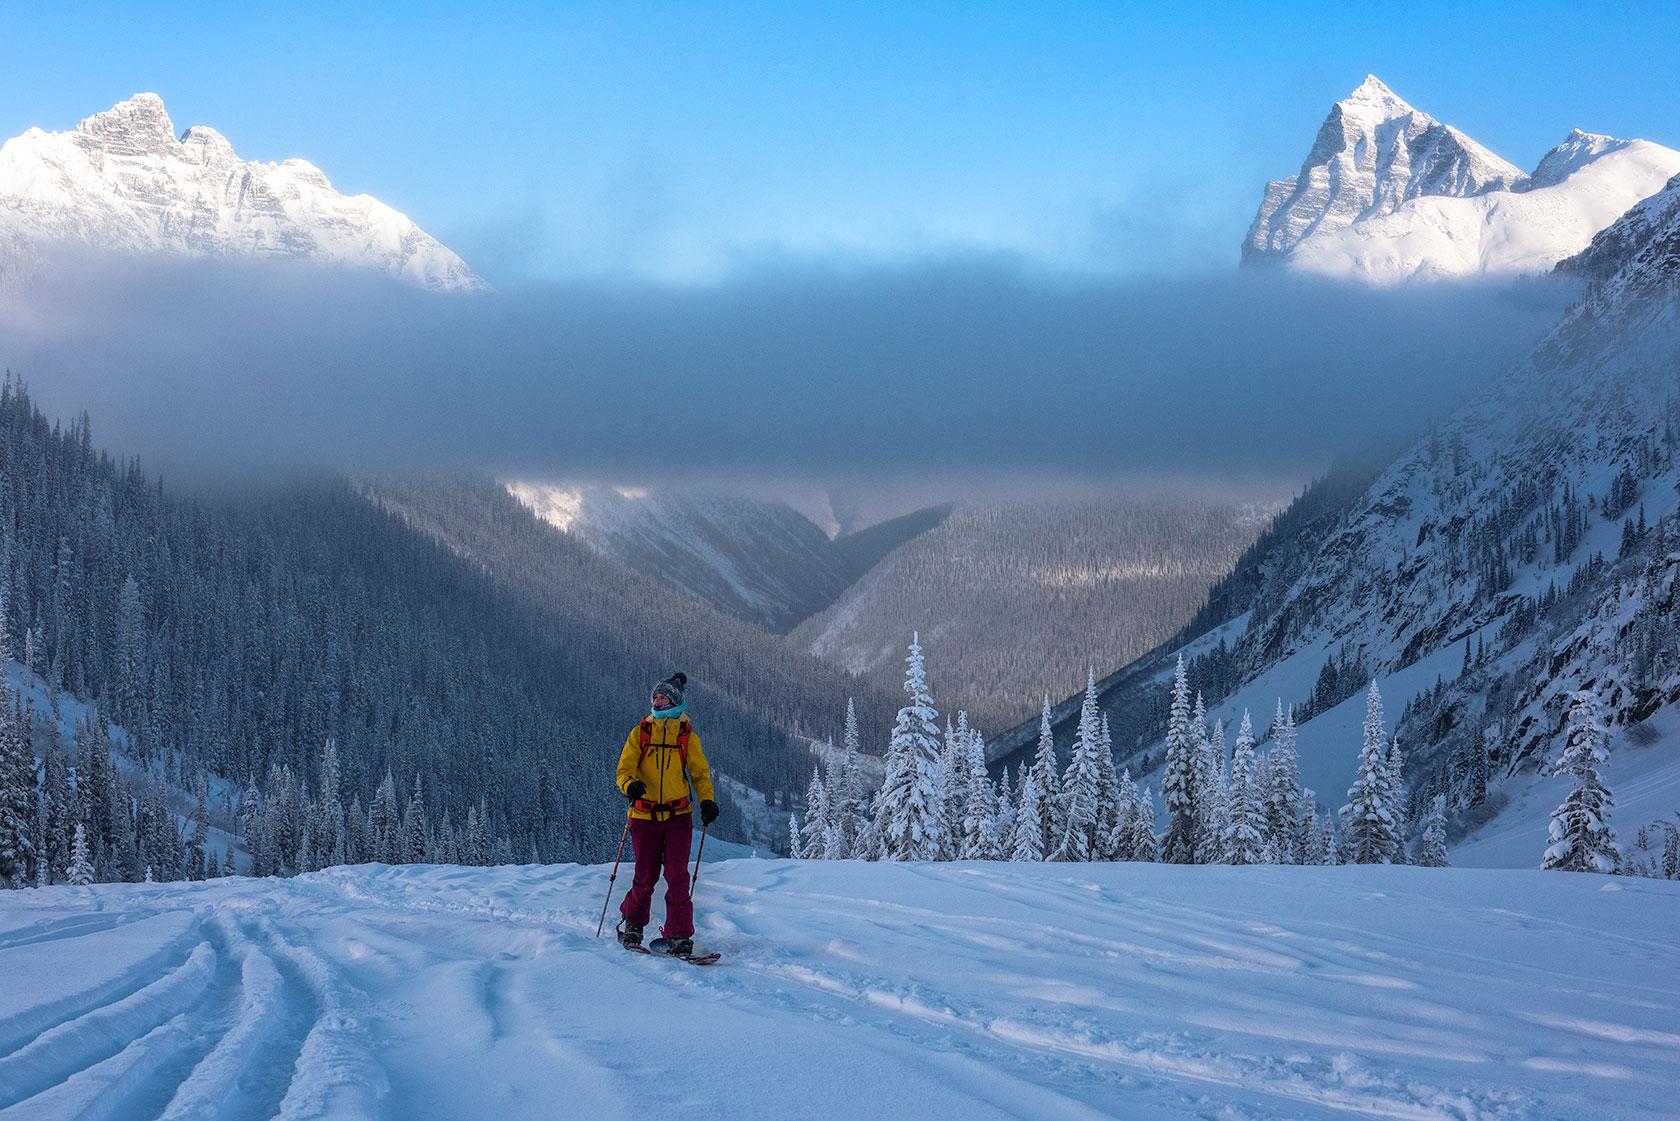 austin-trigg-patagonia-banff-alberta-winter-bacountry-tour-ski-splitboard-adventure-inversion-layer-mountains-rogers-pass-canada-valley.jpg